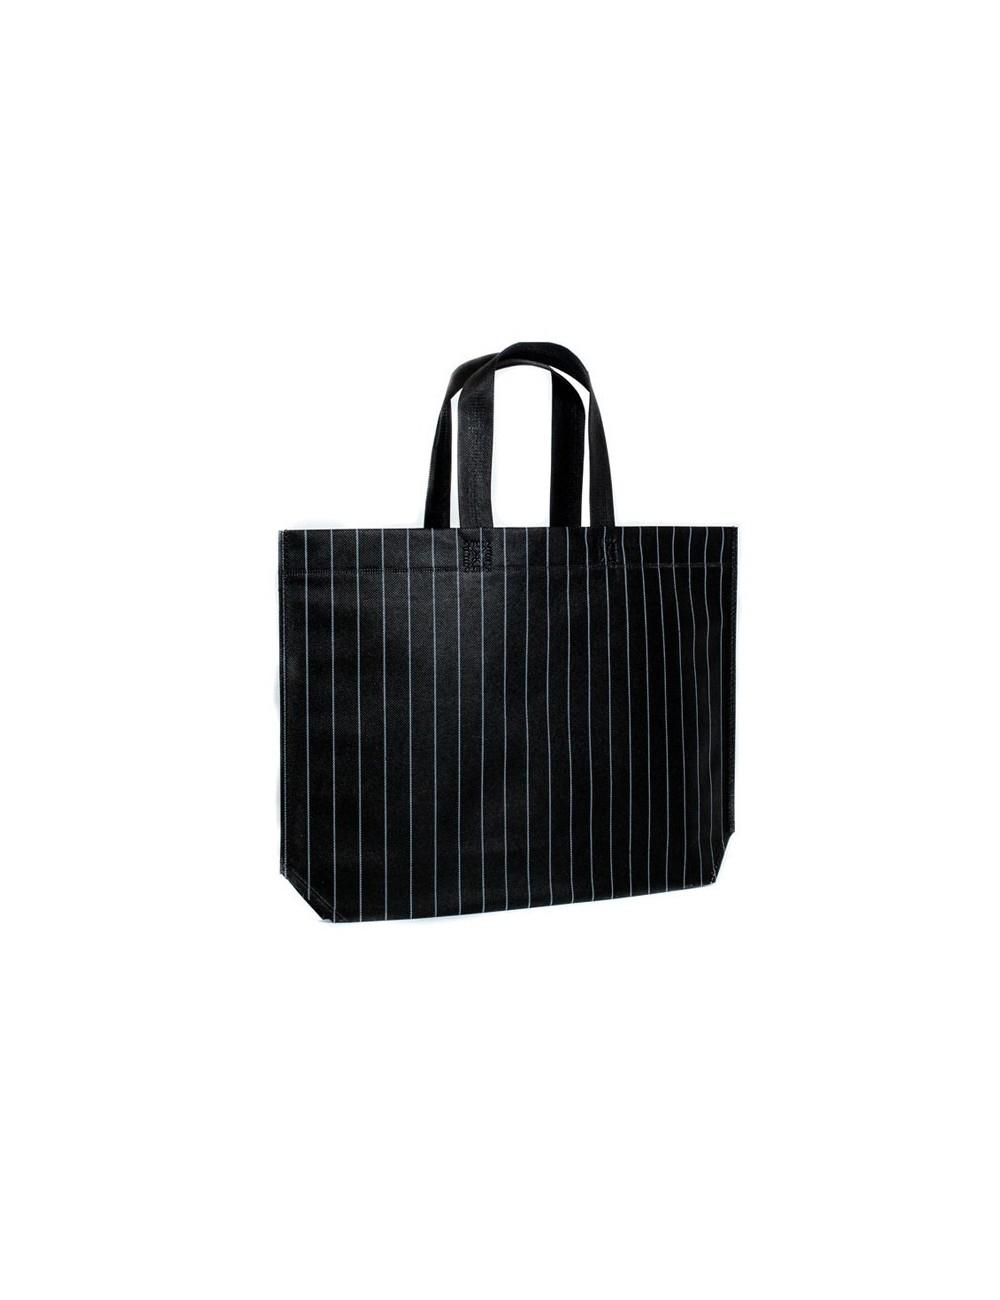 Bolsa MINISTERIO - 44x30x10